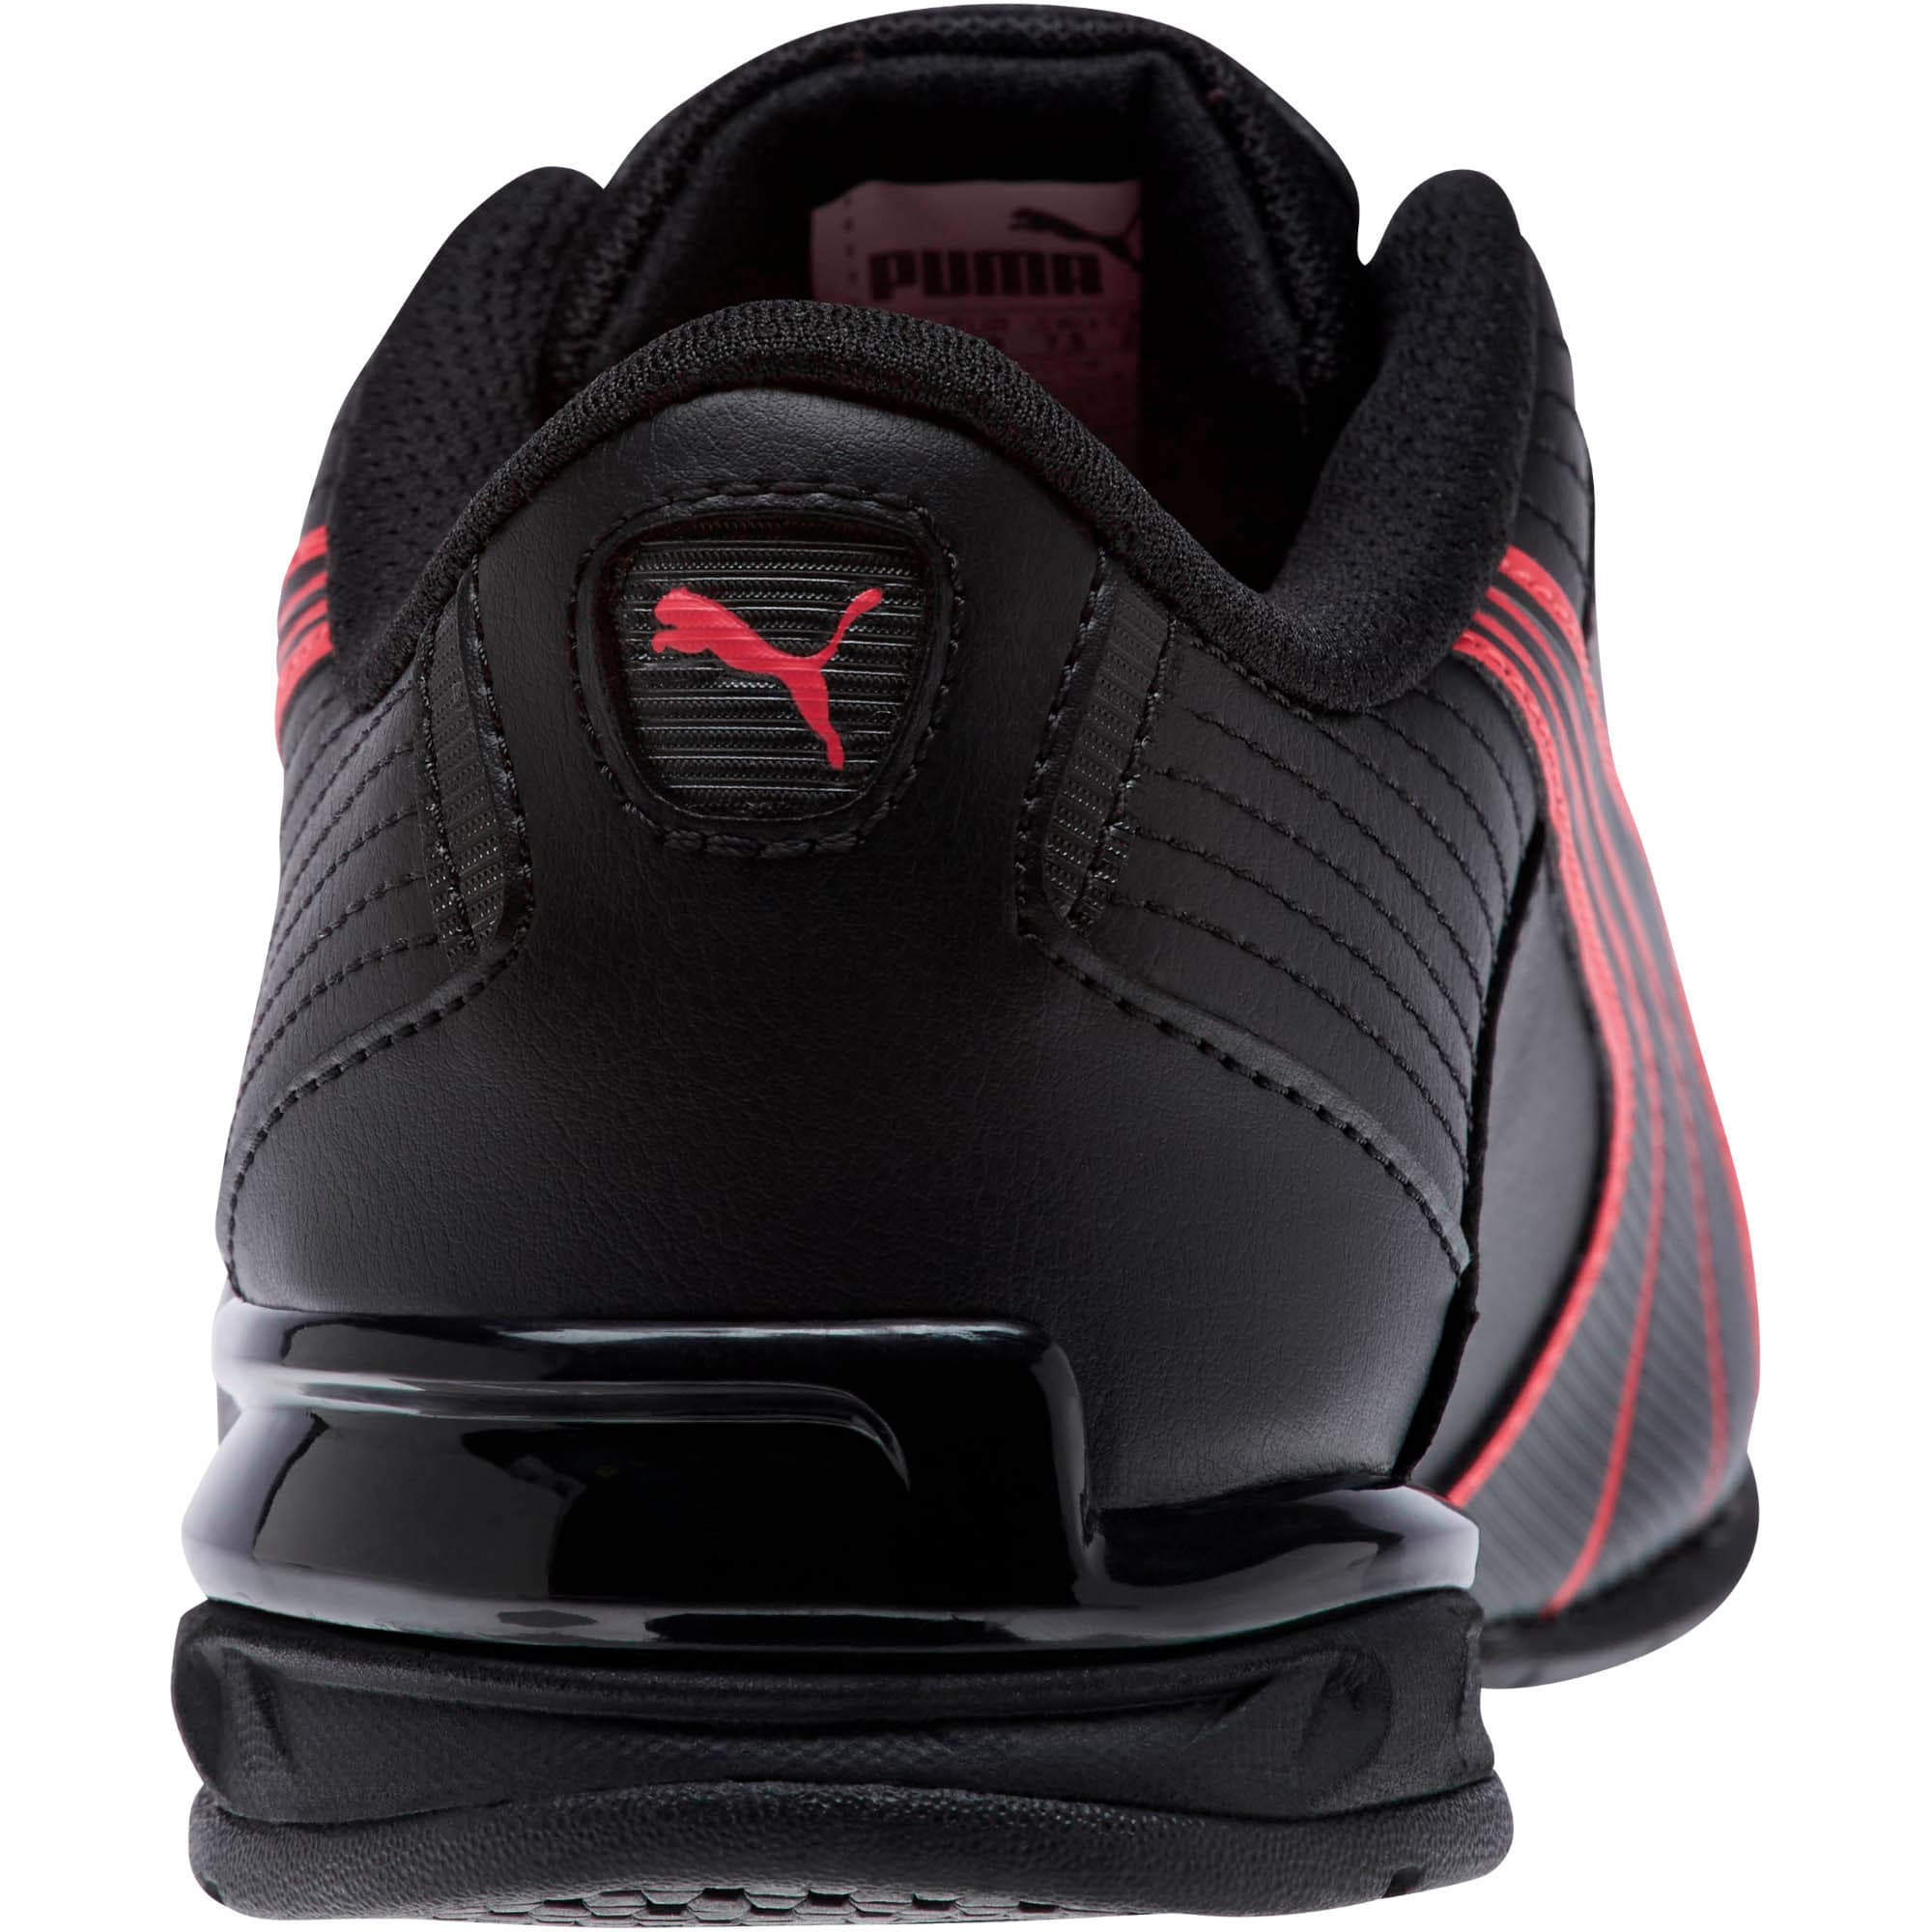 Thumbnail 4 of Super Elevate Women's Training Shoes, Puma Black-Paradise Pink, medium